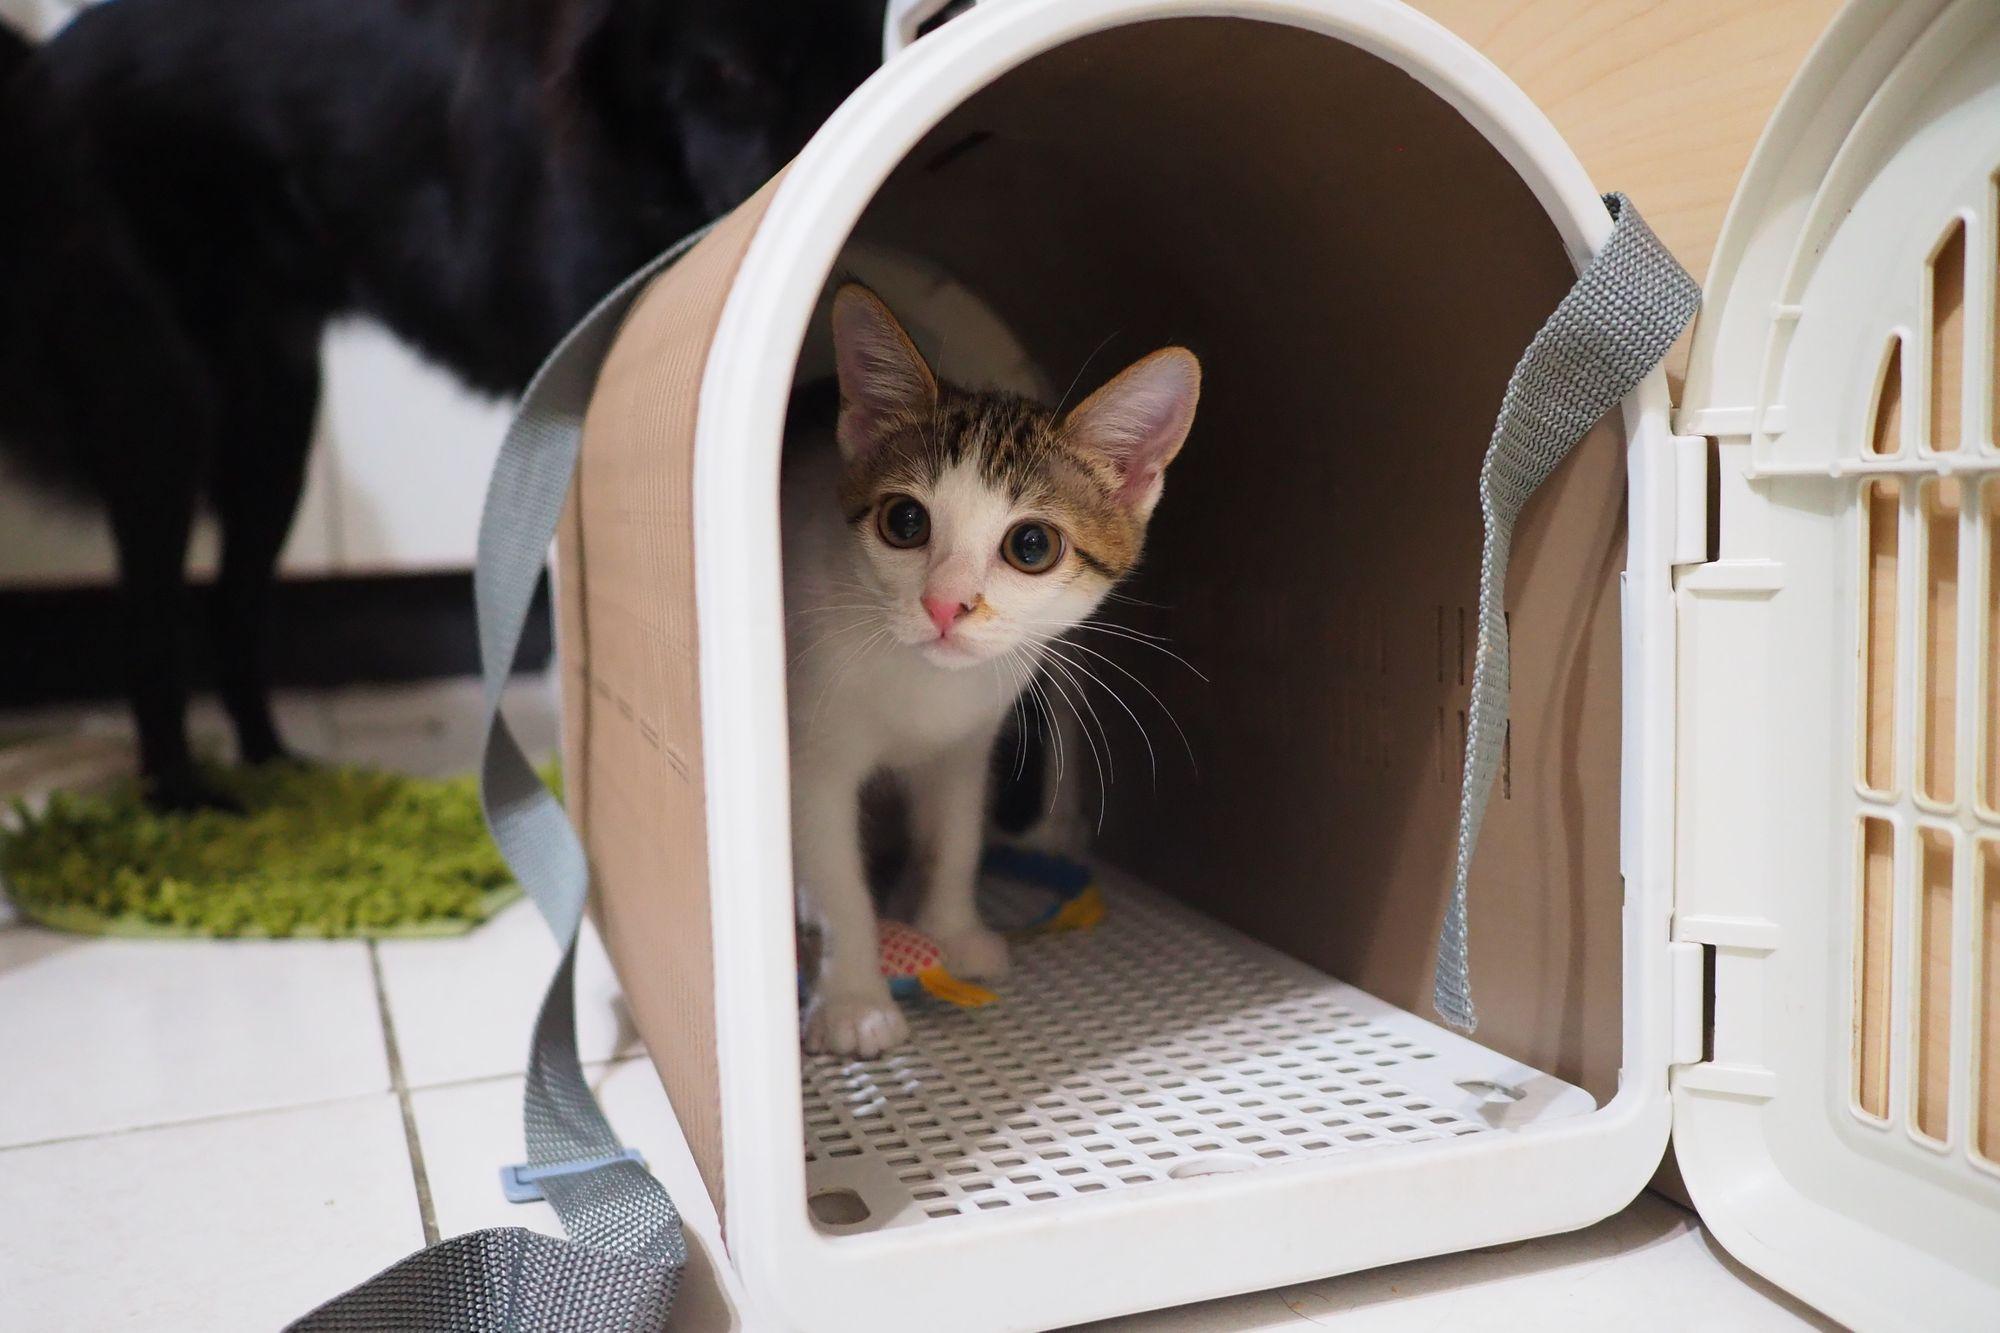 https://hahow.in/courses/5d1429dbac23d80020ad8544?utm_source=blog&utm_medium=random&utm_campaign=cat-healing-methods